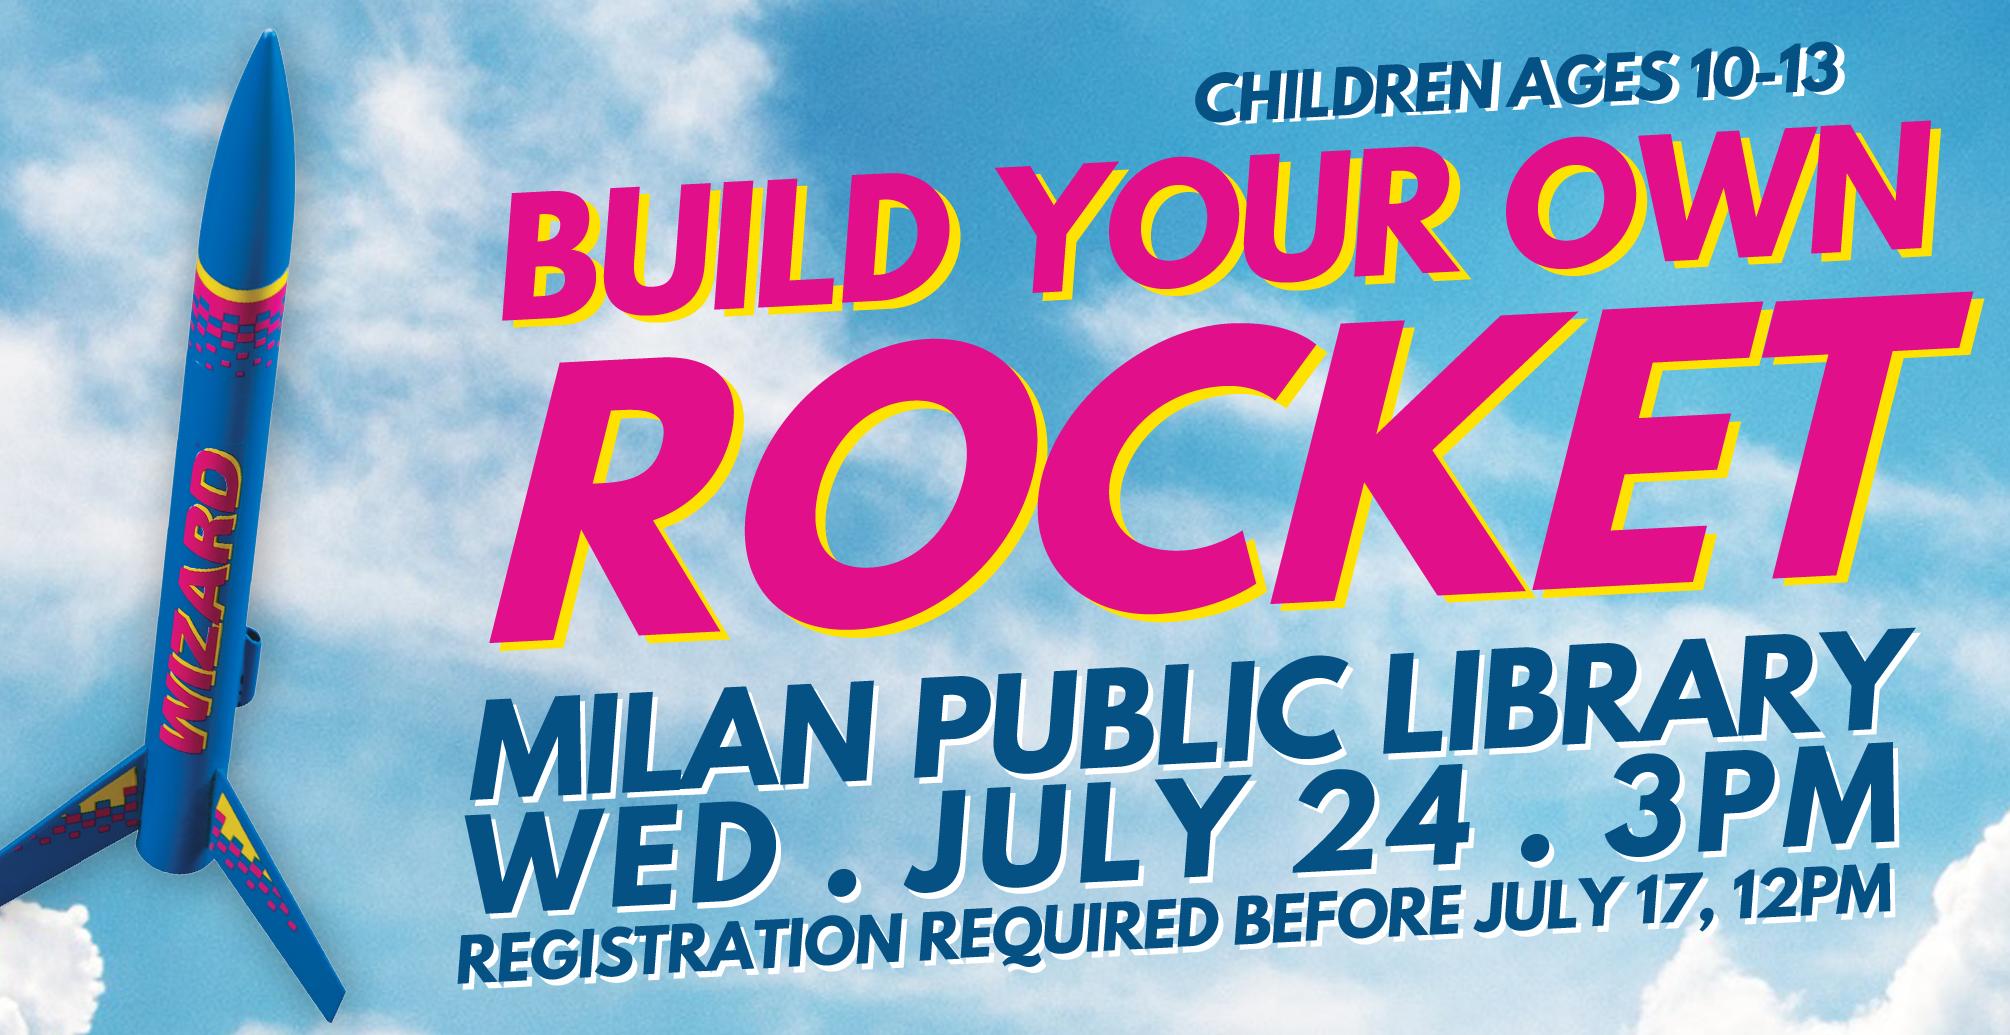 2019-07-CHILDRENS-Milan-Rocket-Slide